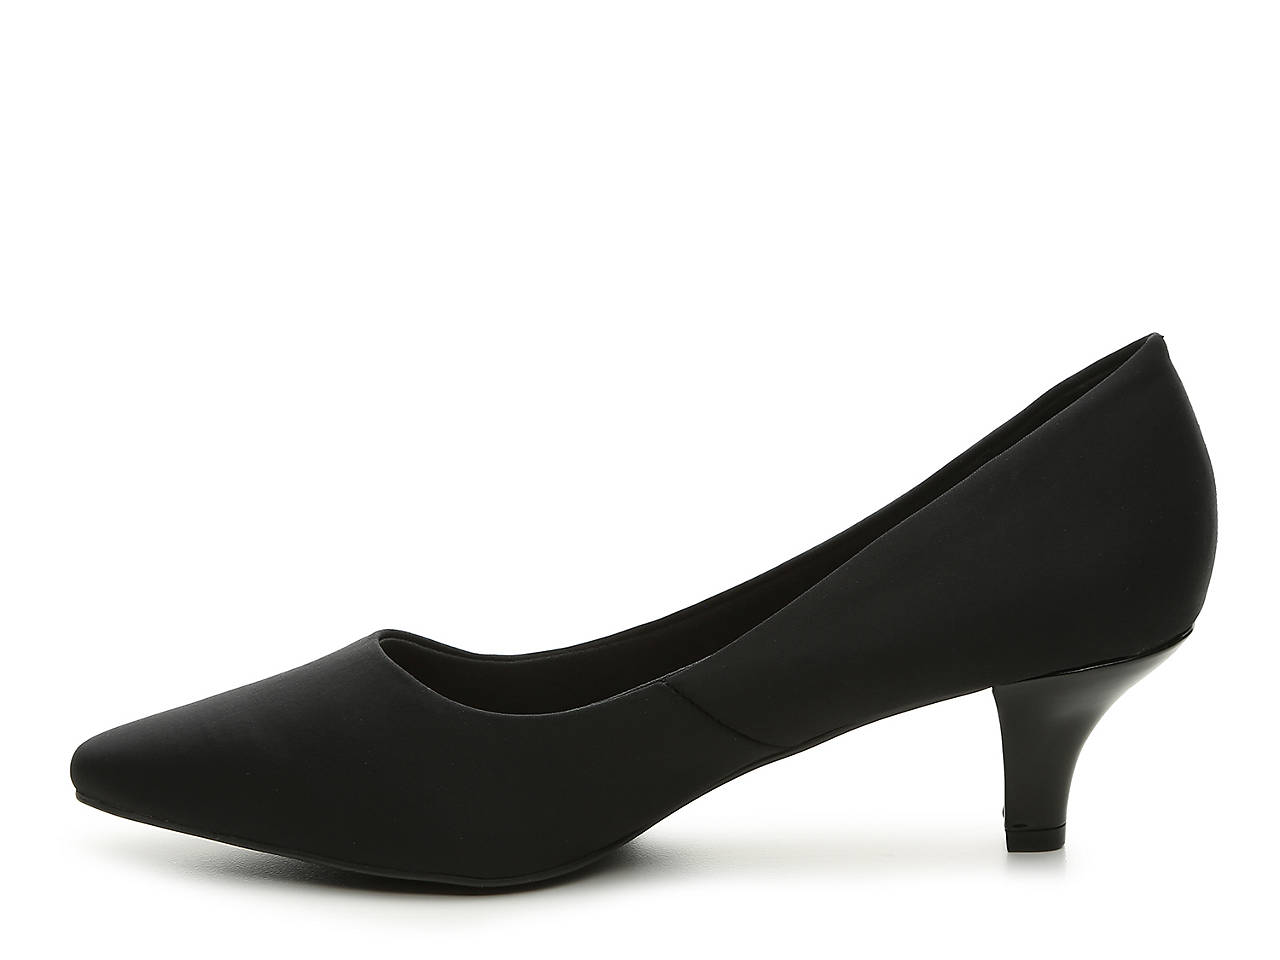 1d4b63b2251a Abella Judith Pump Women s Shoes